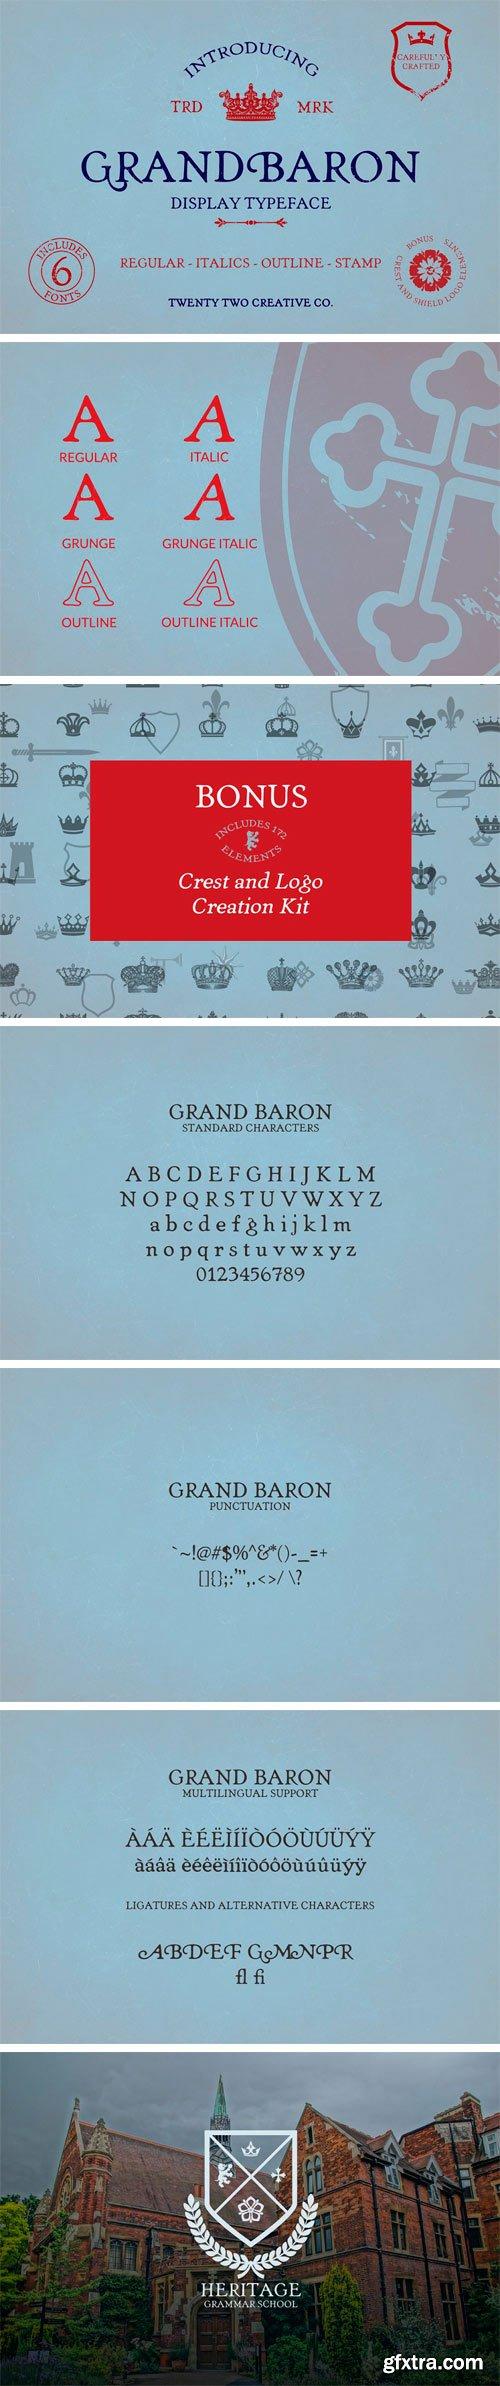 CM - Grand Baron - A Vintage Typeface 3377110